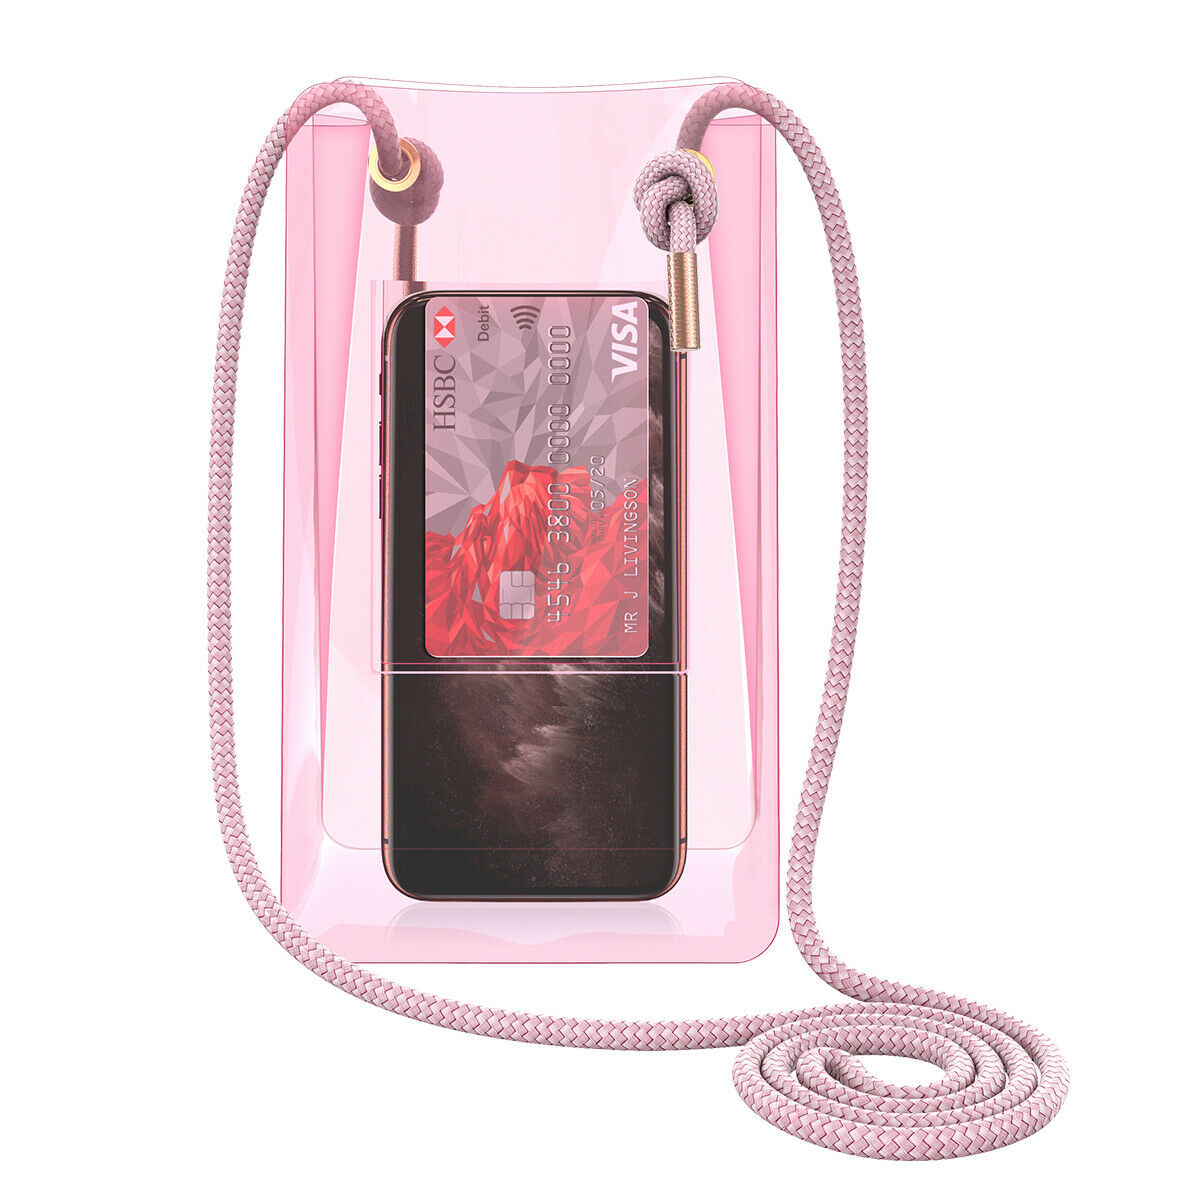 Mini Crossbody Bag with Strap Clear Rose Gold PVC Phone/Make